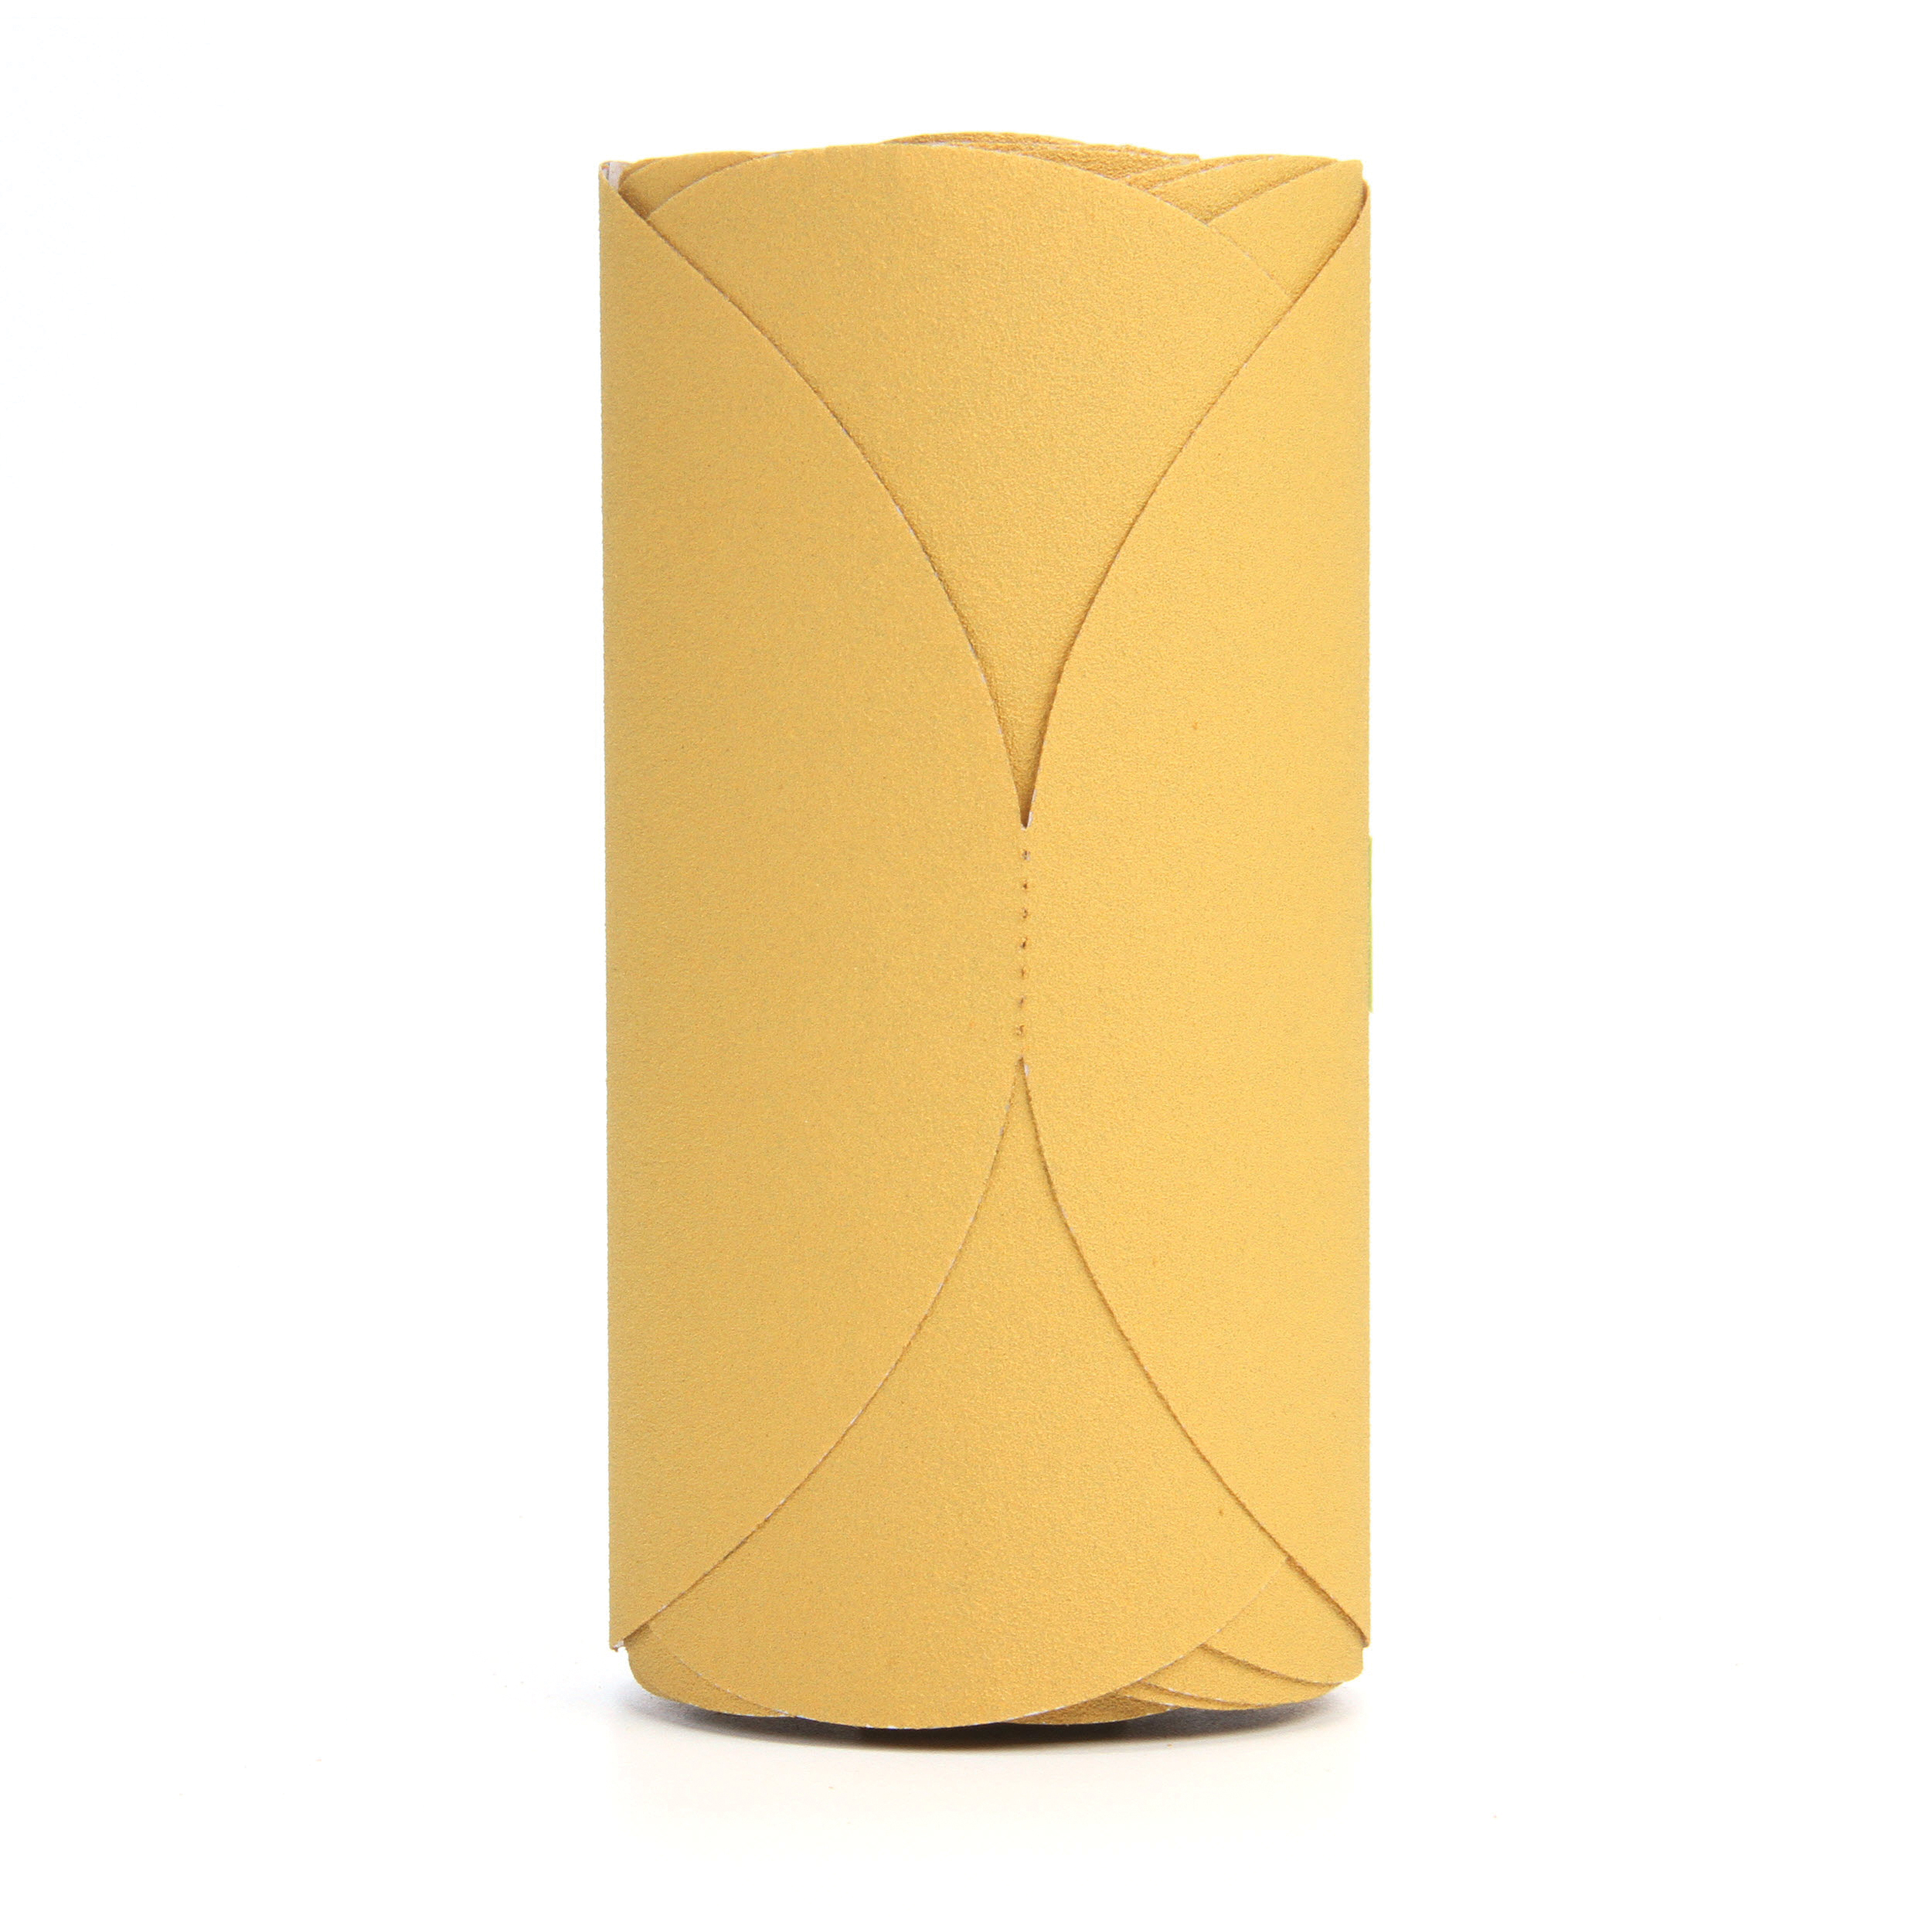 3M™ Stikit™ 051131-01331 Open Coated PSA Abrasive Disc Roll, 6 in Dia Disc, P120 Grit, Coarse Grade, Aluminum Oxide Abrasive, Film Backing